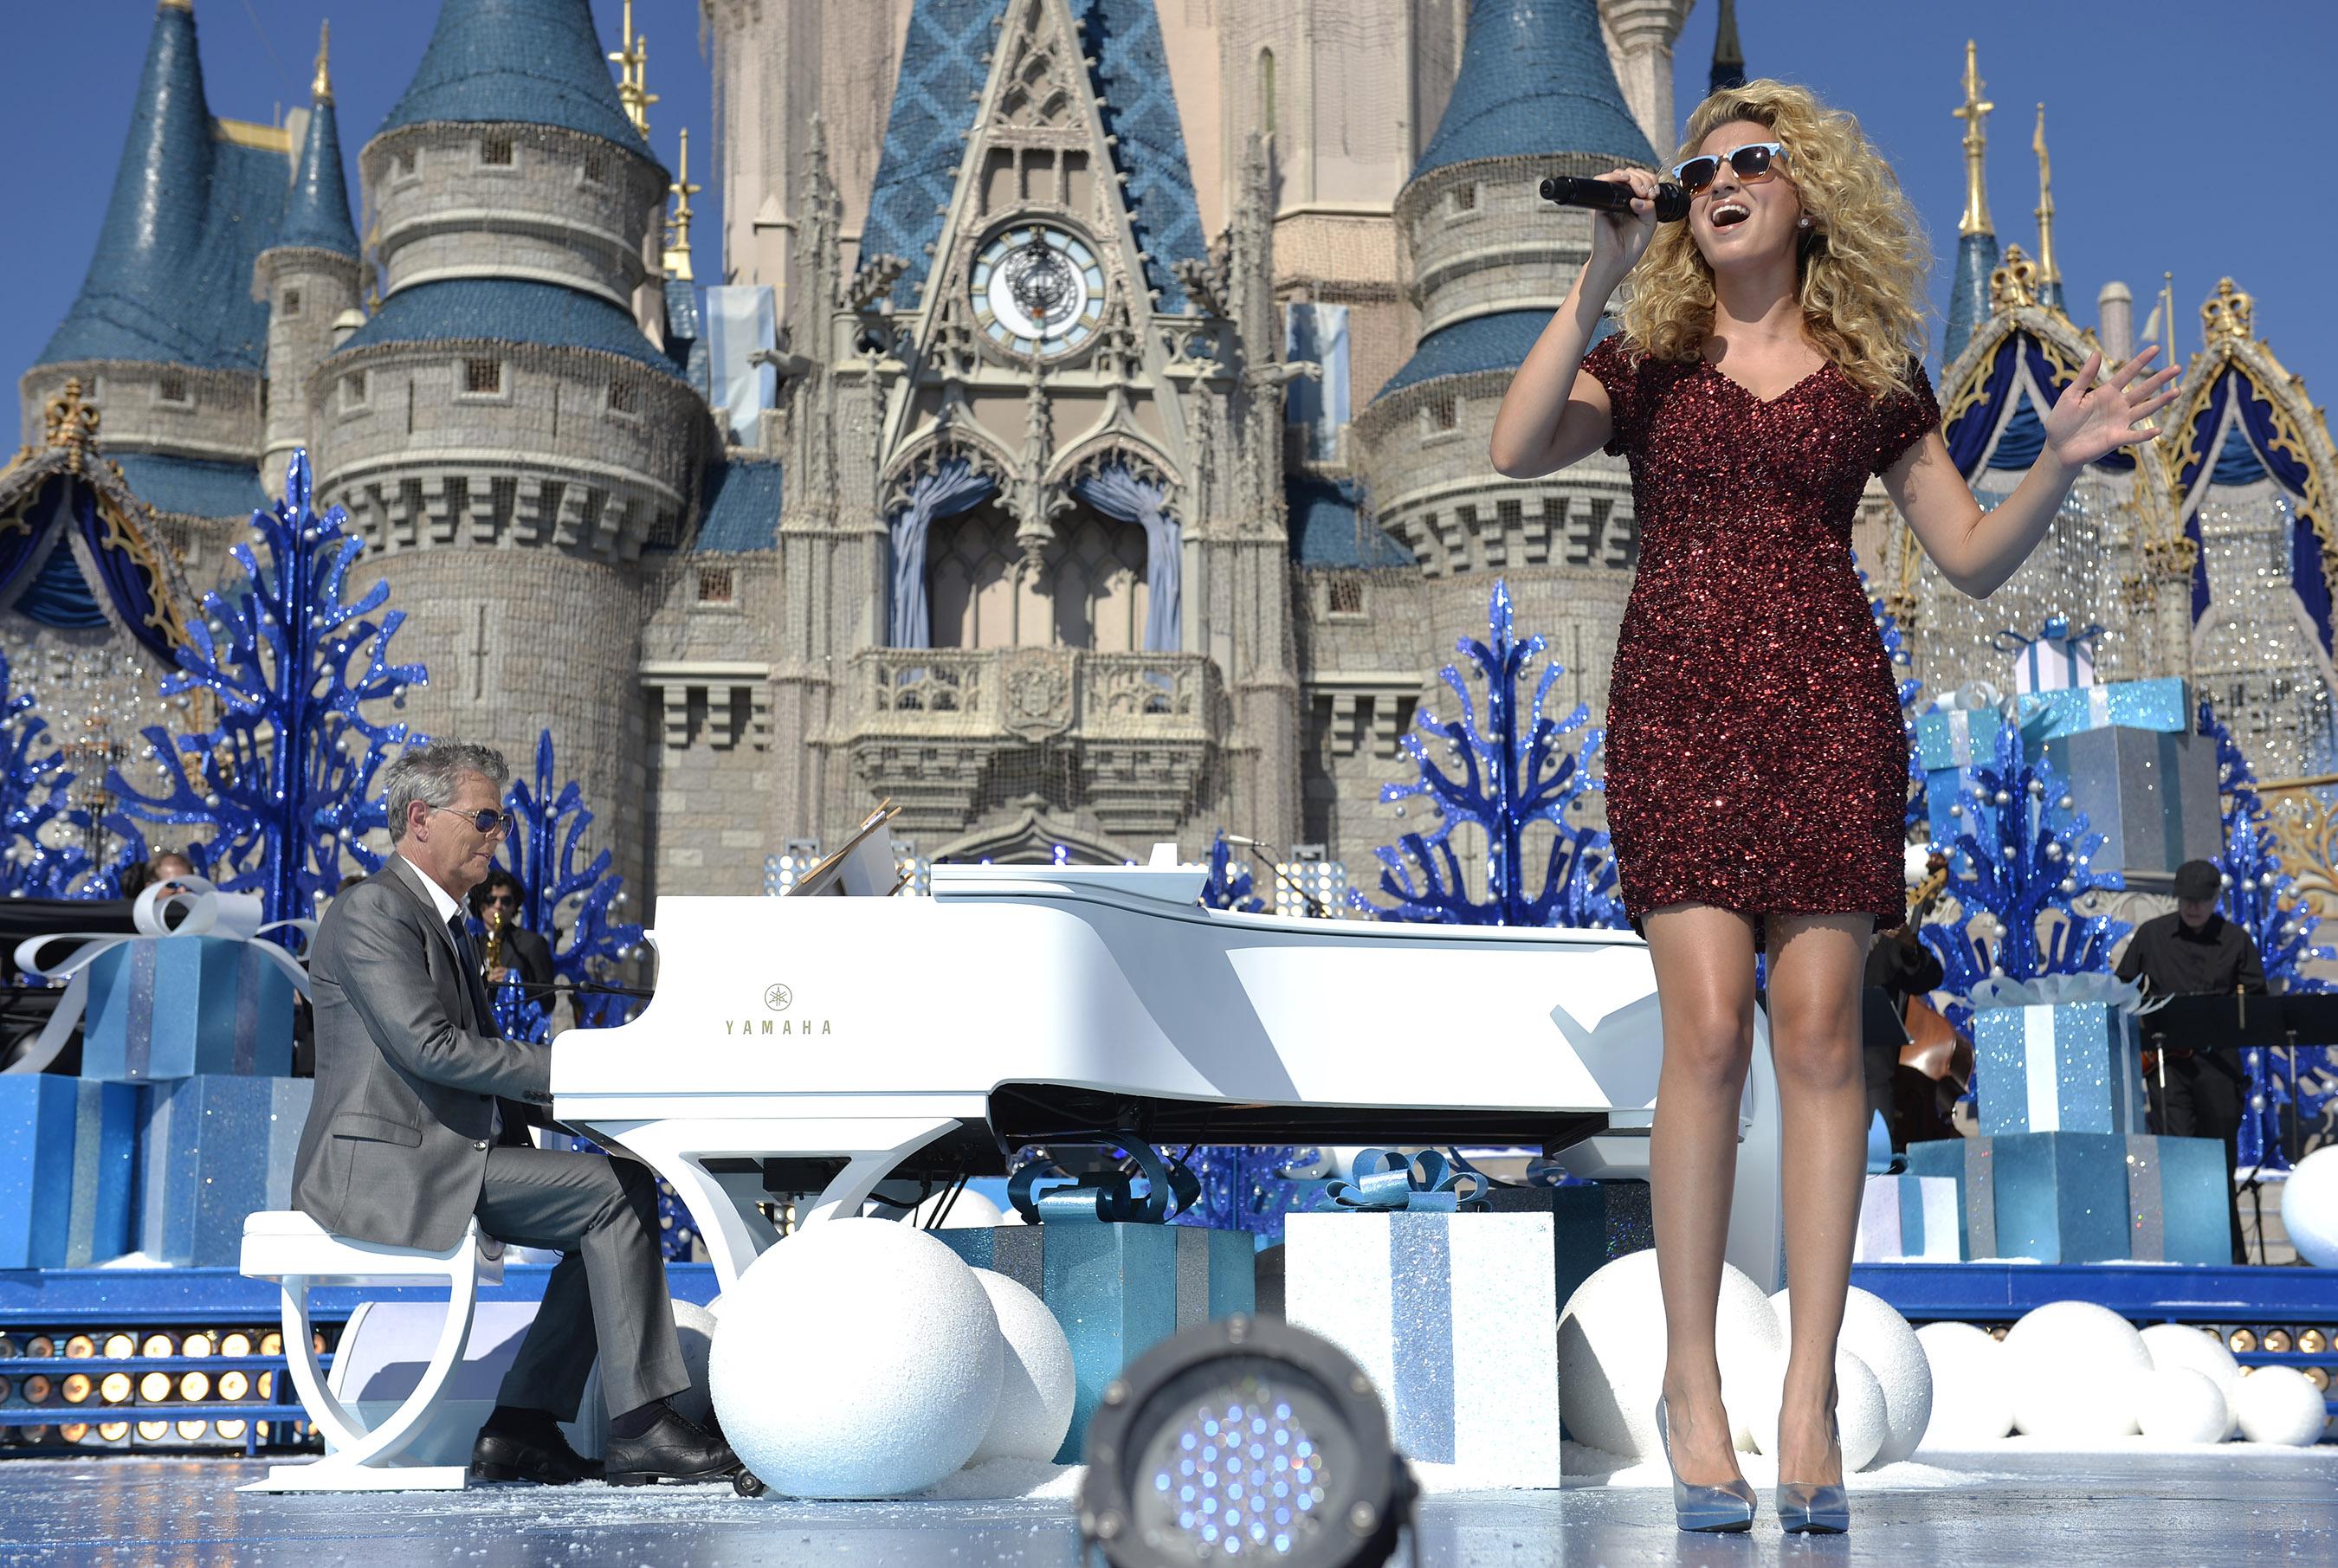 disney - Disney Christmas 2015